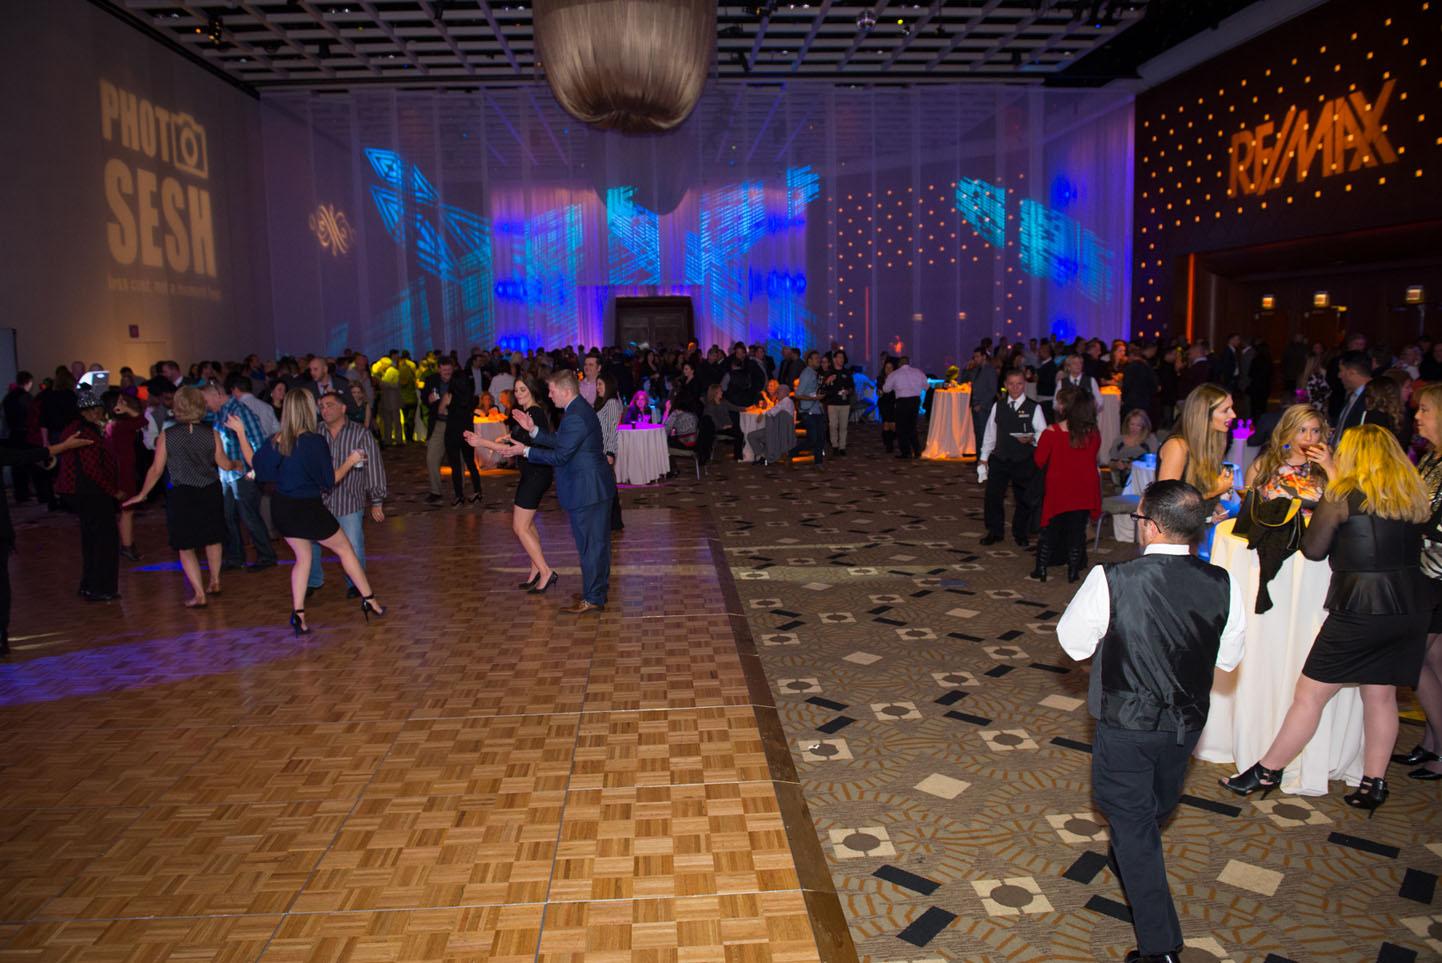 2015-12-09 ReMax Corpoarte Event - The Borgata - Atlantic City NJ - Photo Sesh - 2015-5120.jpg